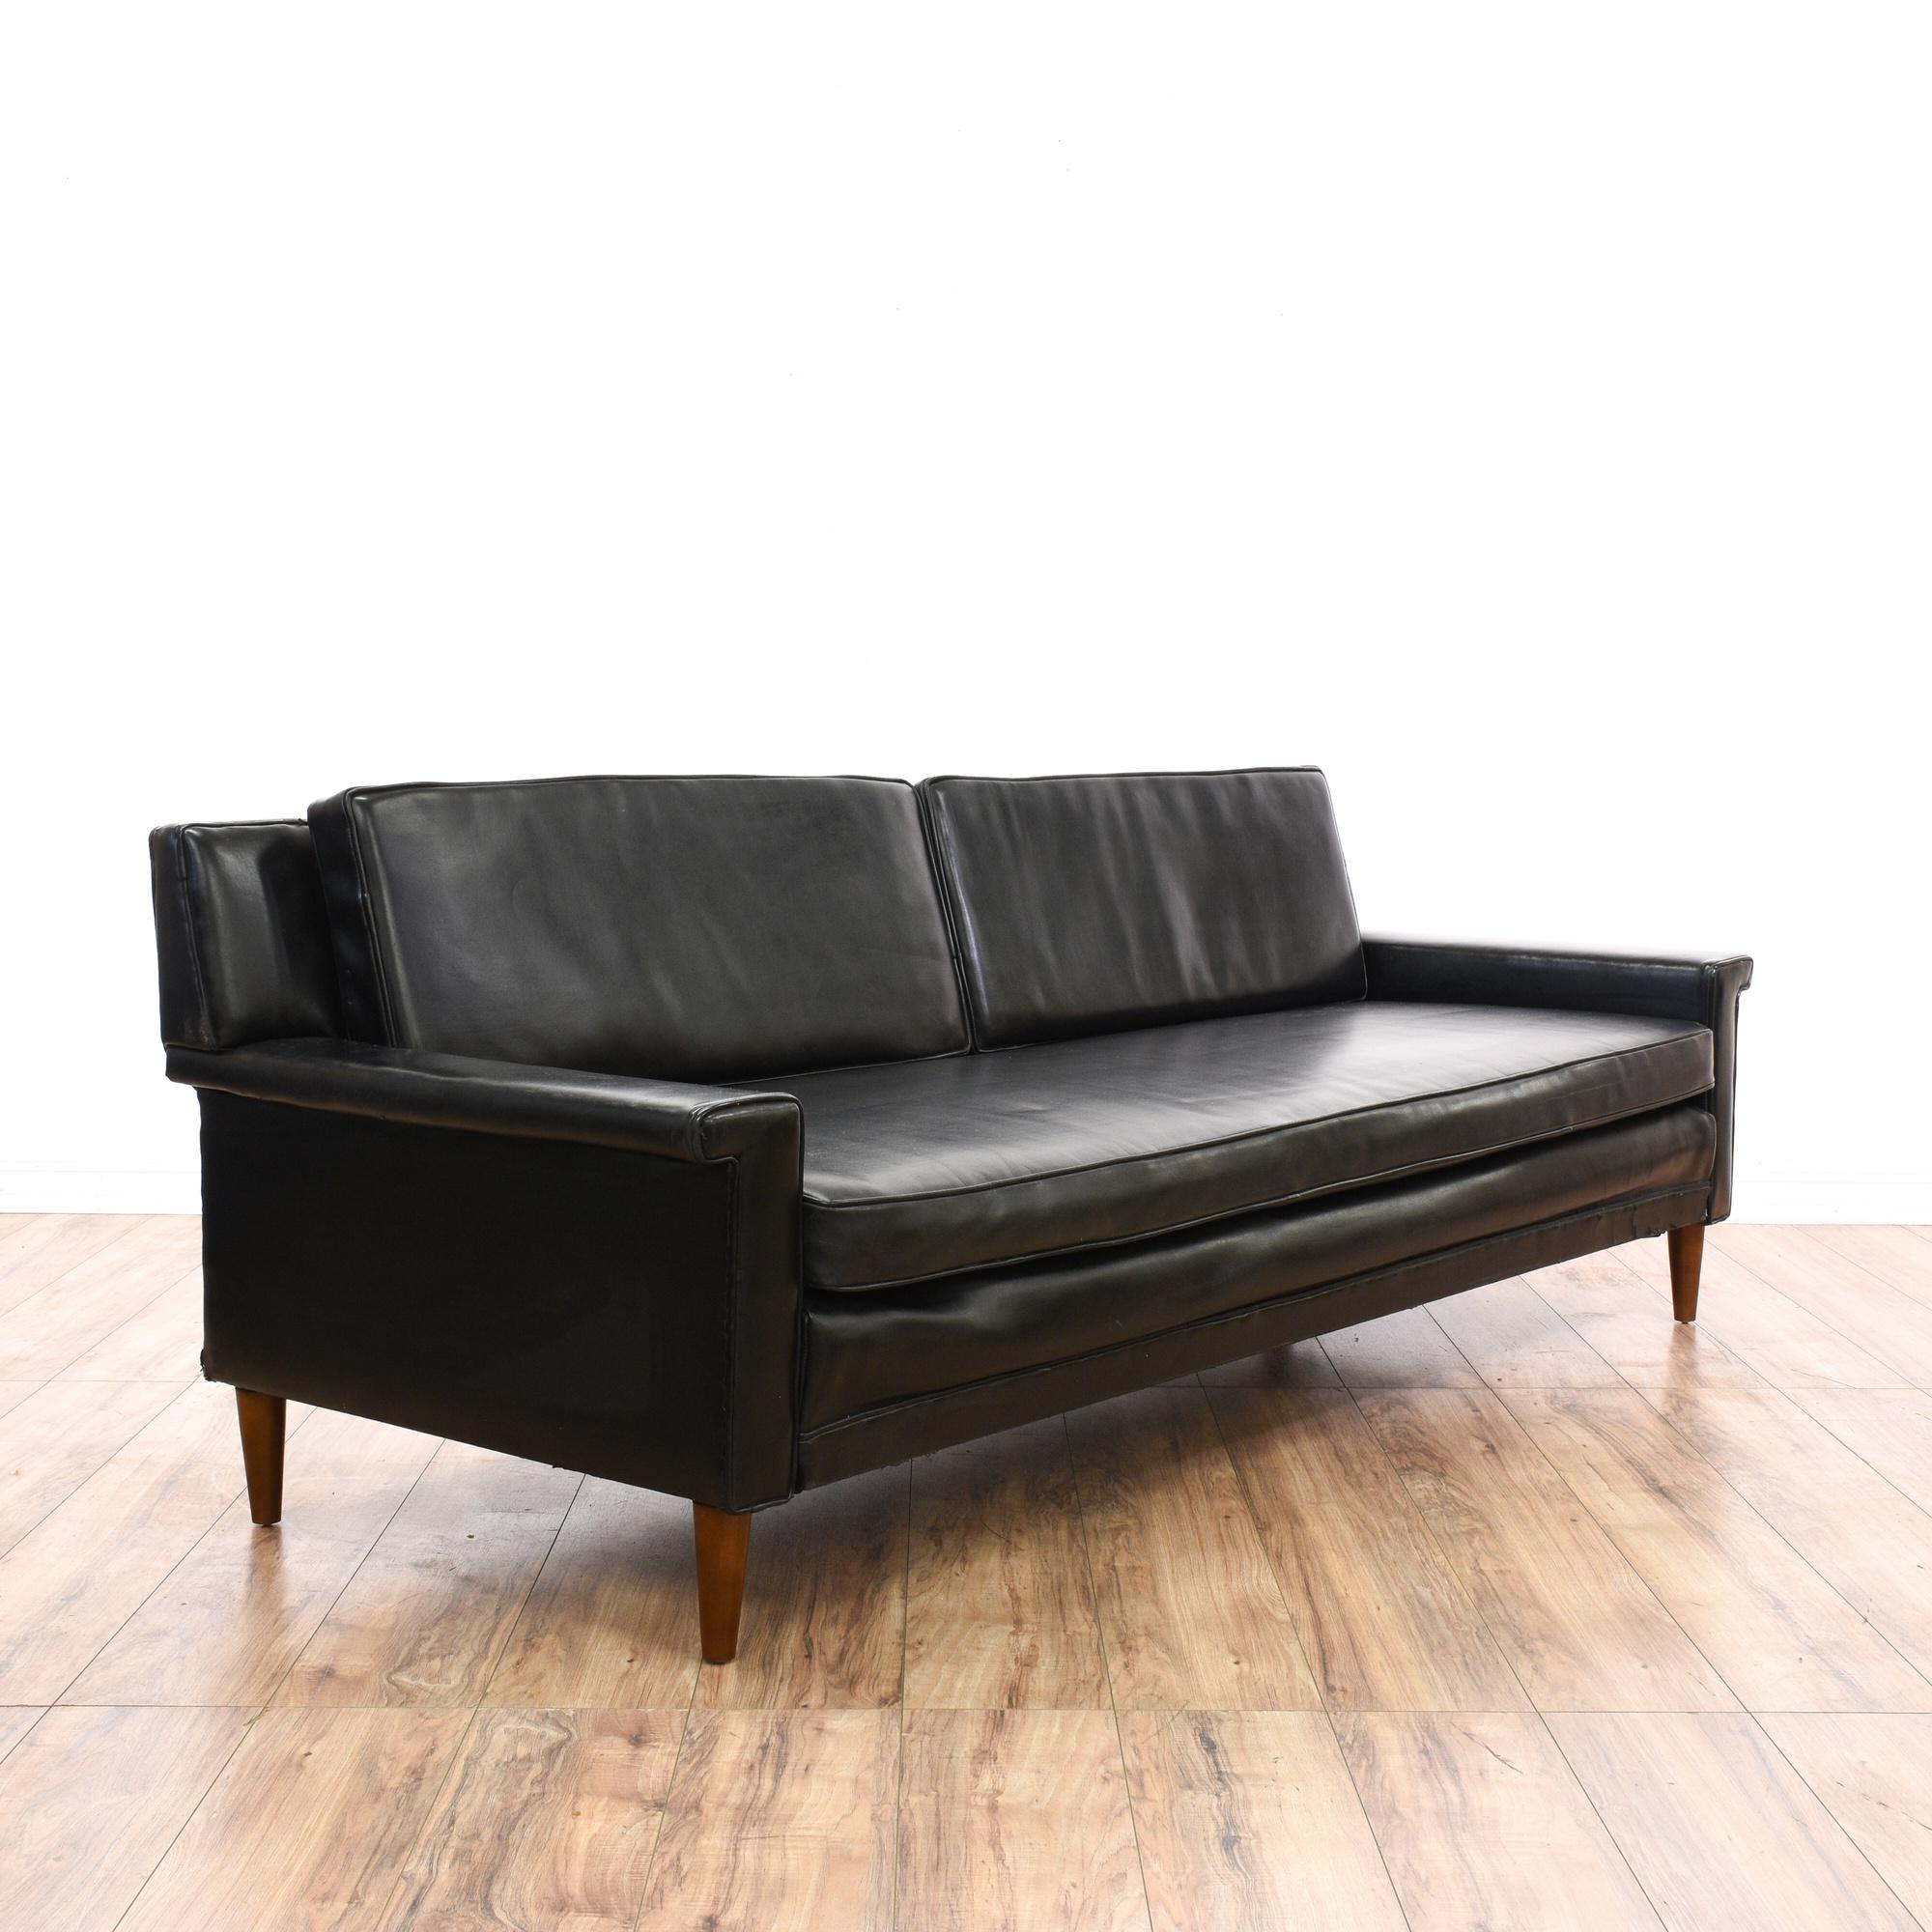 Mid Century Modern Sofa Bed: Black Vinyl Mid Century Modern Roll Out Sofa Bed